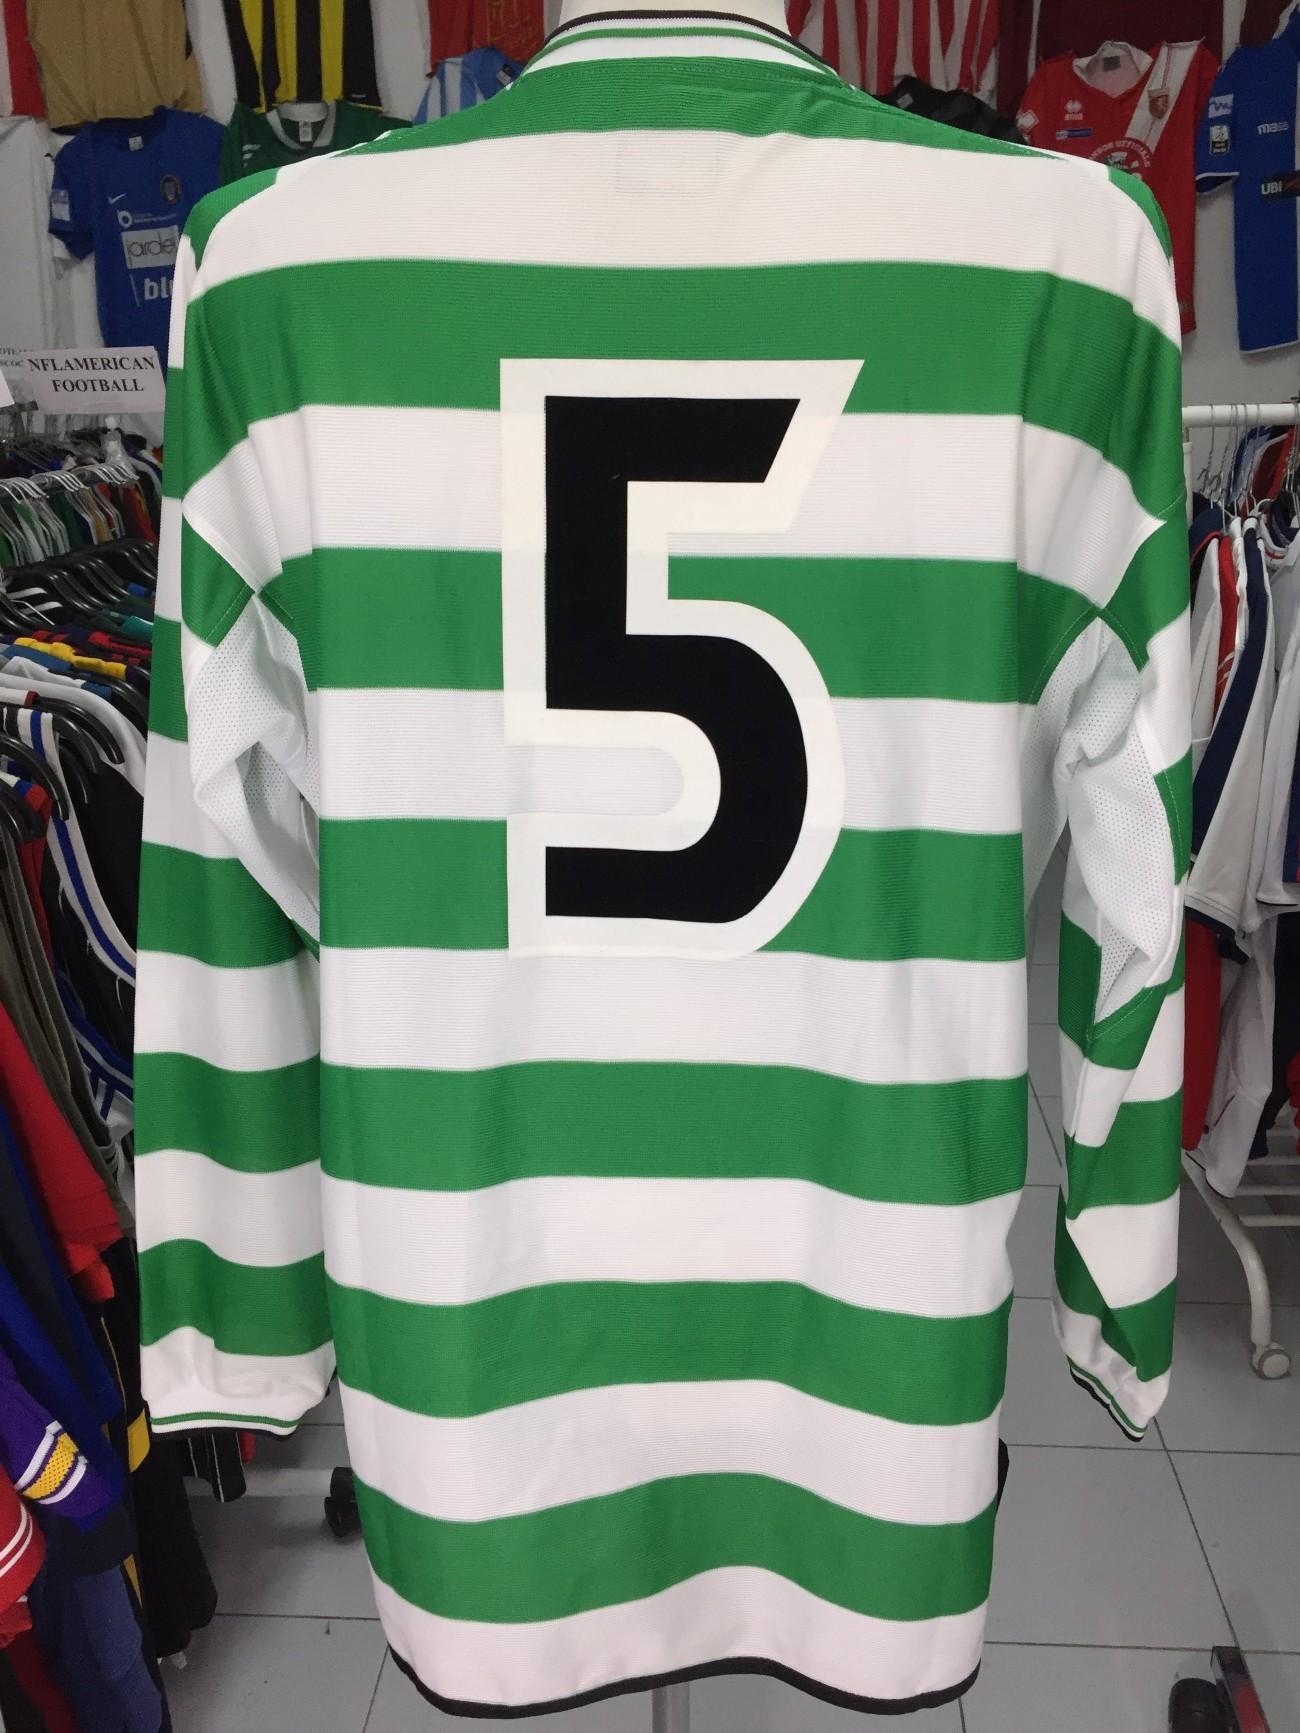 522c6658fa7 Celtic Glasgow FC Home Shirt 2001-02 (XL) #5 Long Sleeve Matchworn ...